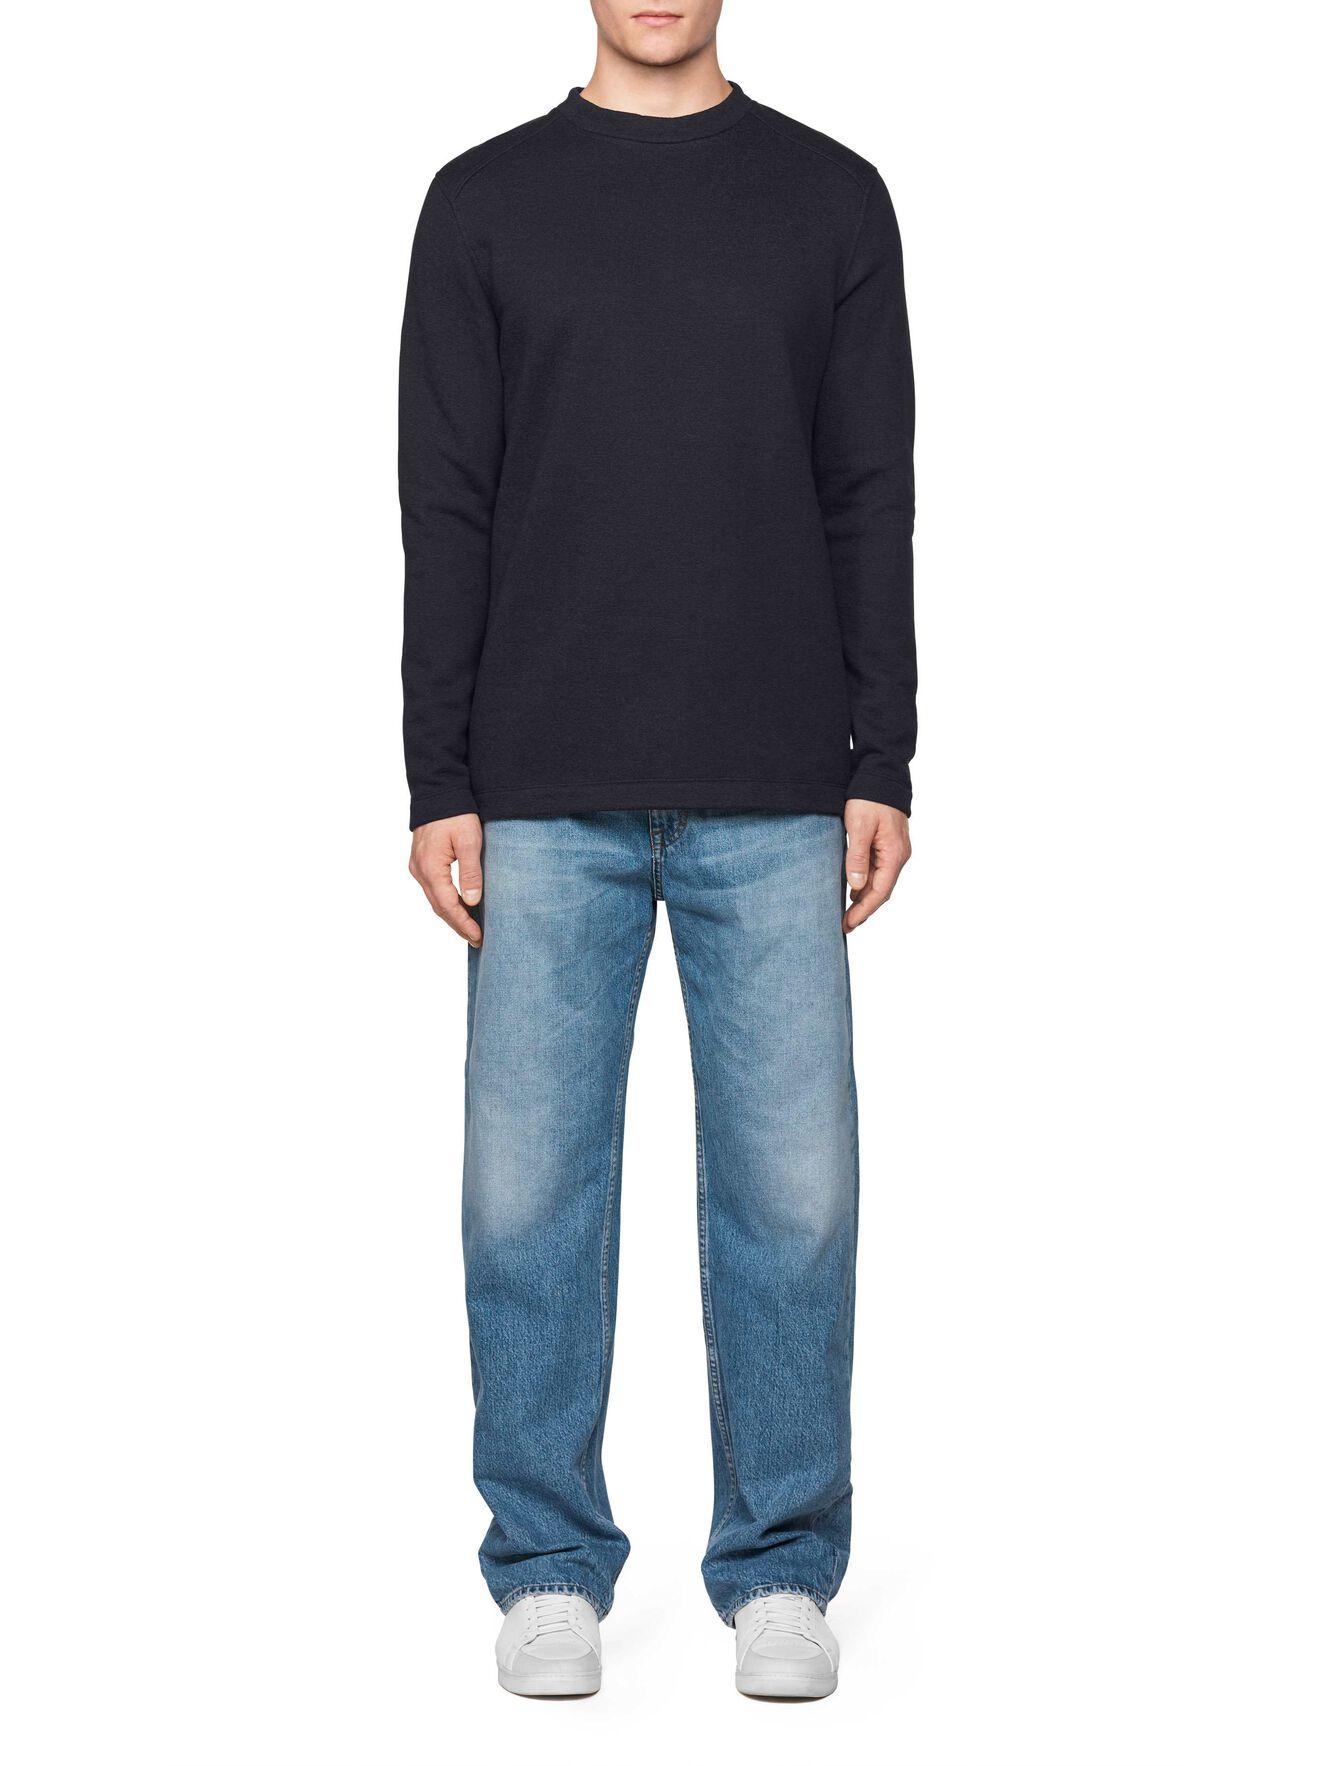 Zac Sweatshirt in Black from Tiger of Sweden